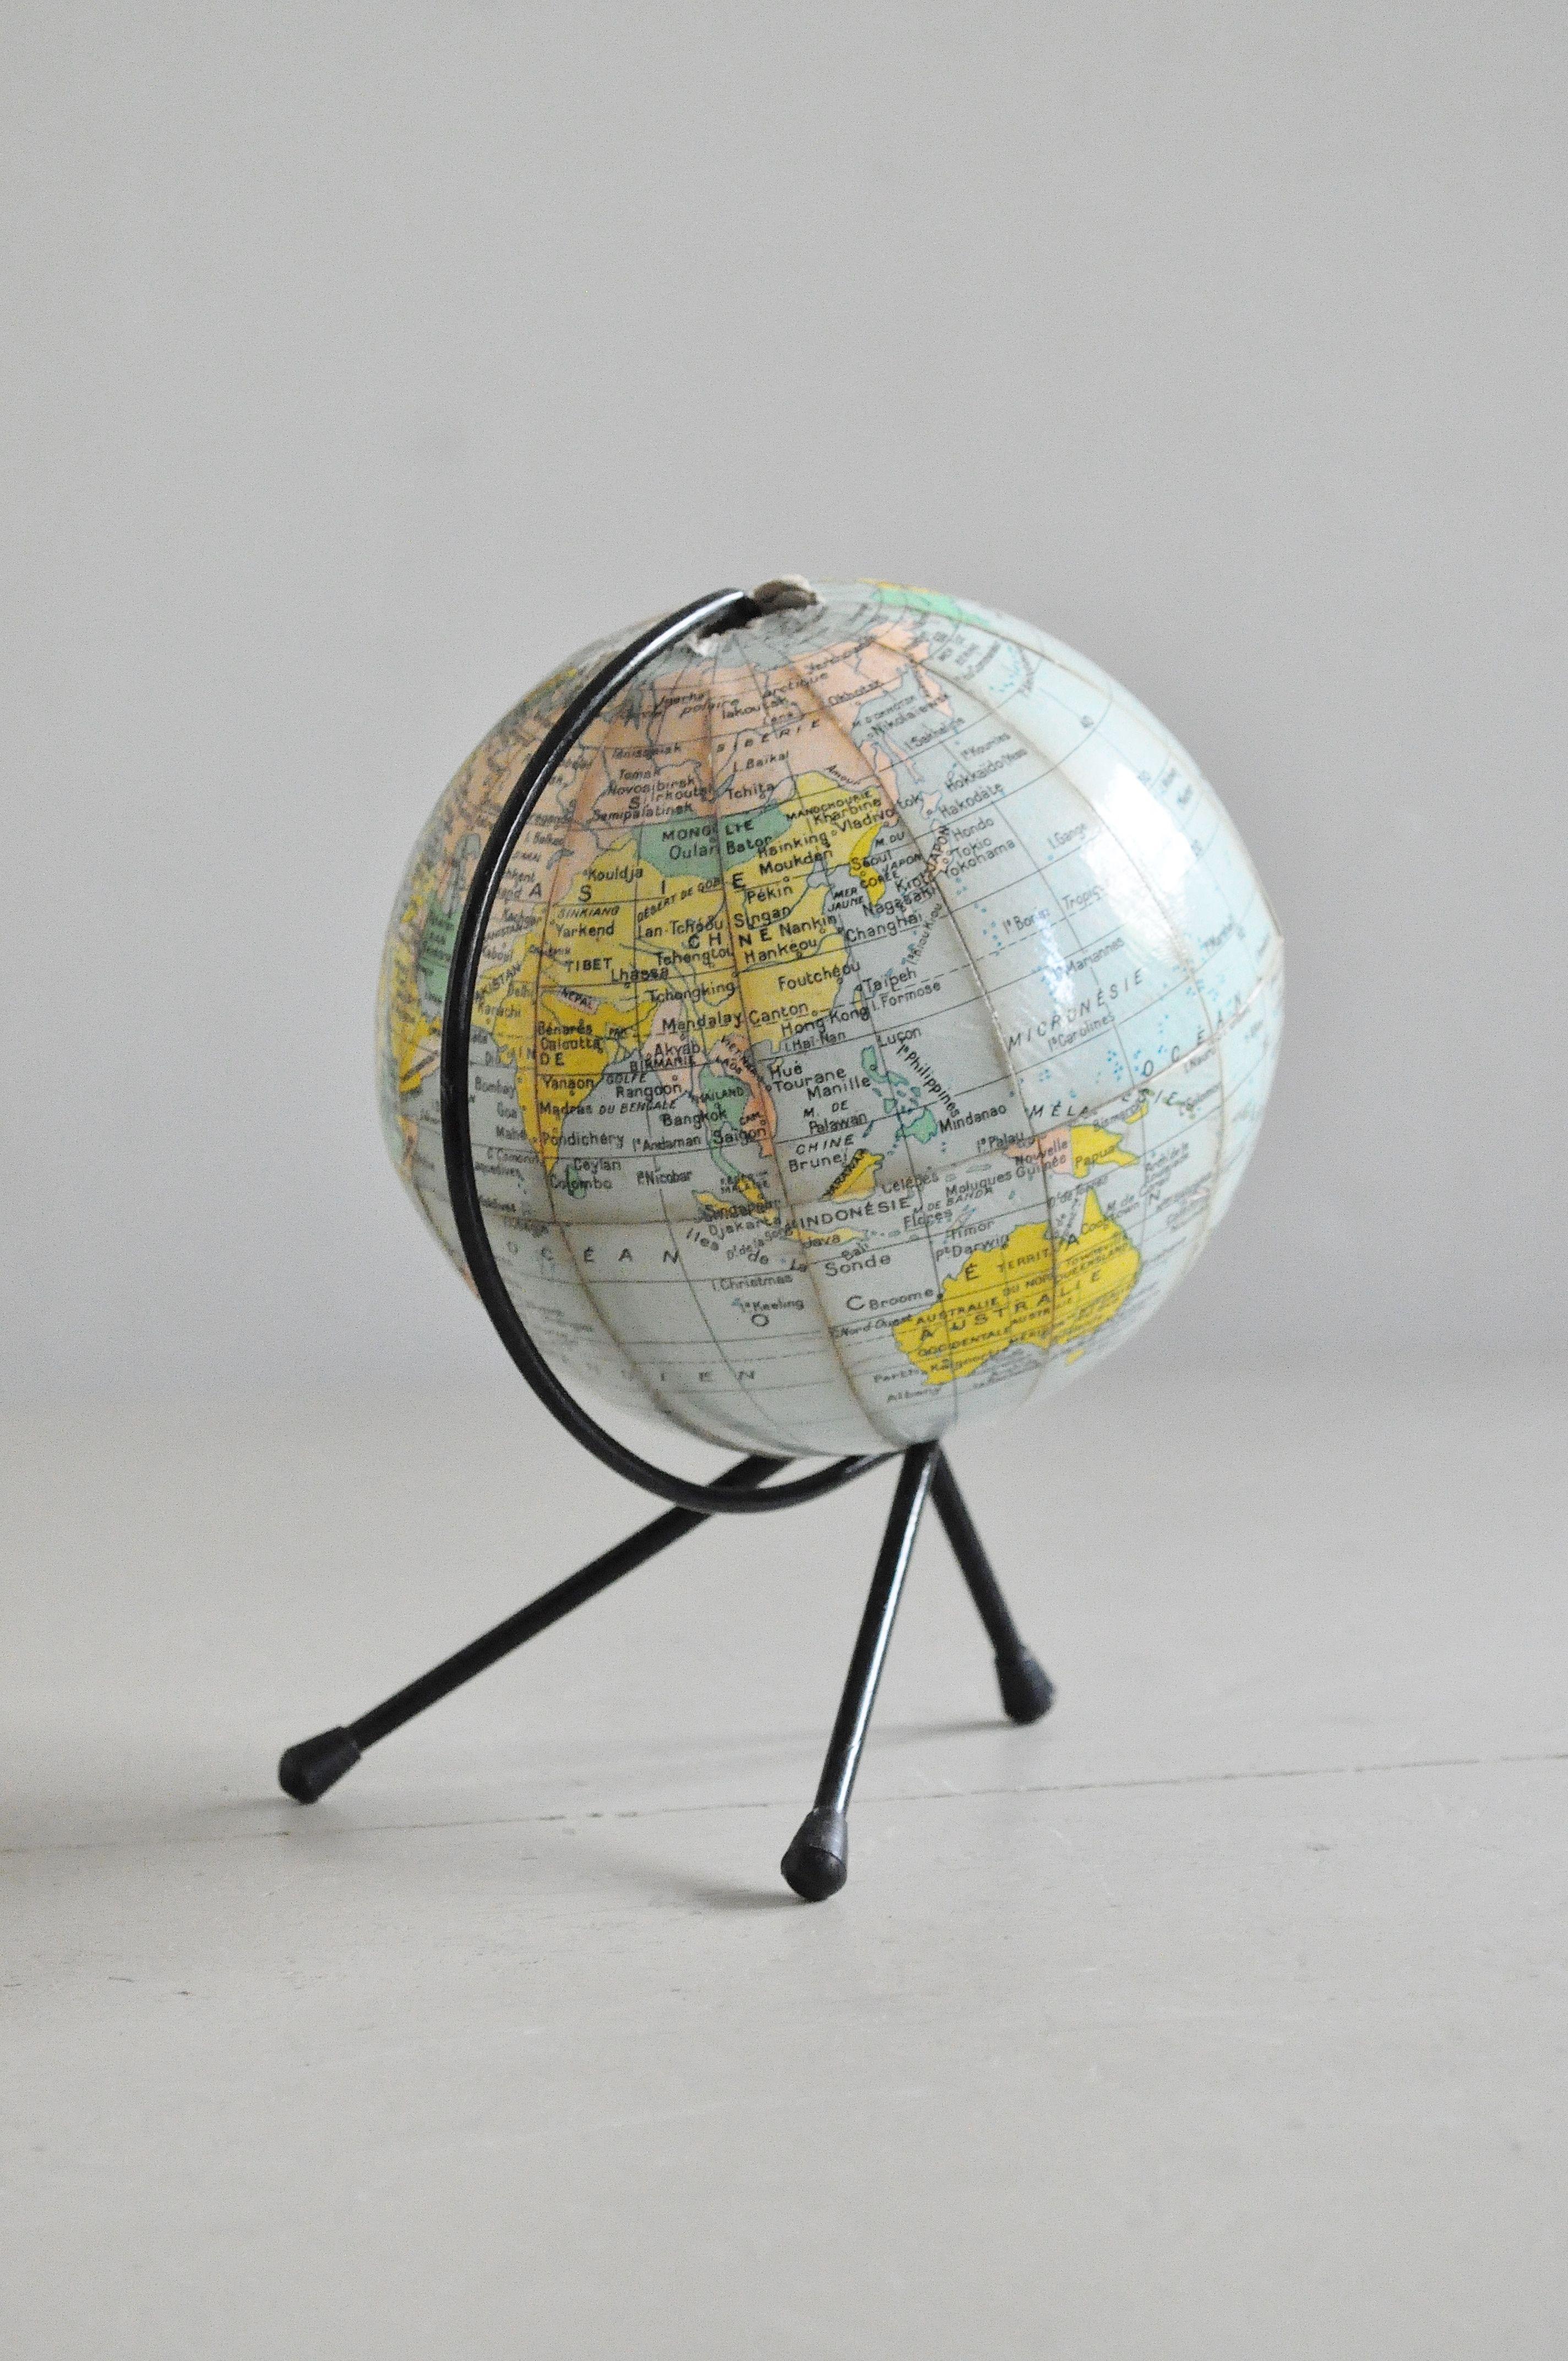 petit globe terrestre stuff pinterest globe. Black Bedroom Furniture Sets. Home Design Ideas